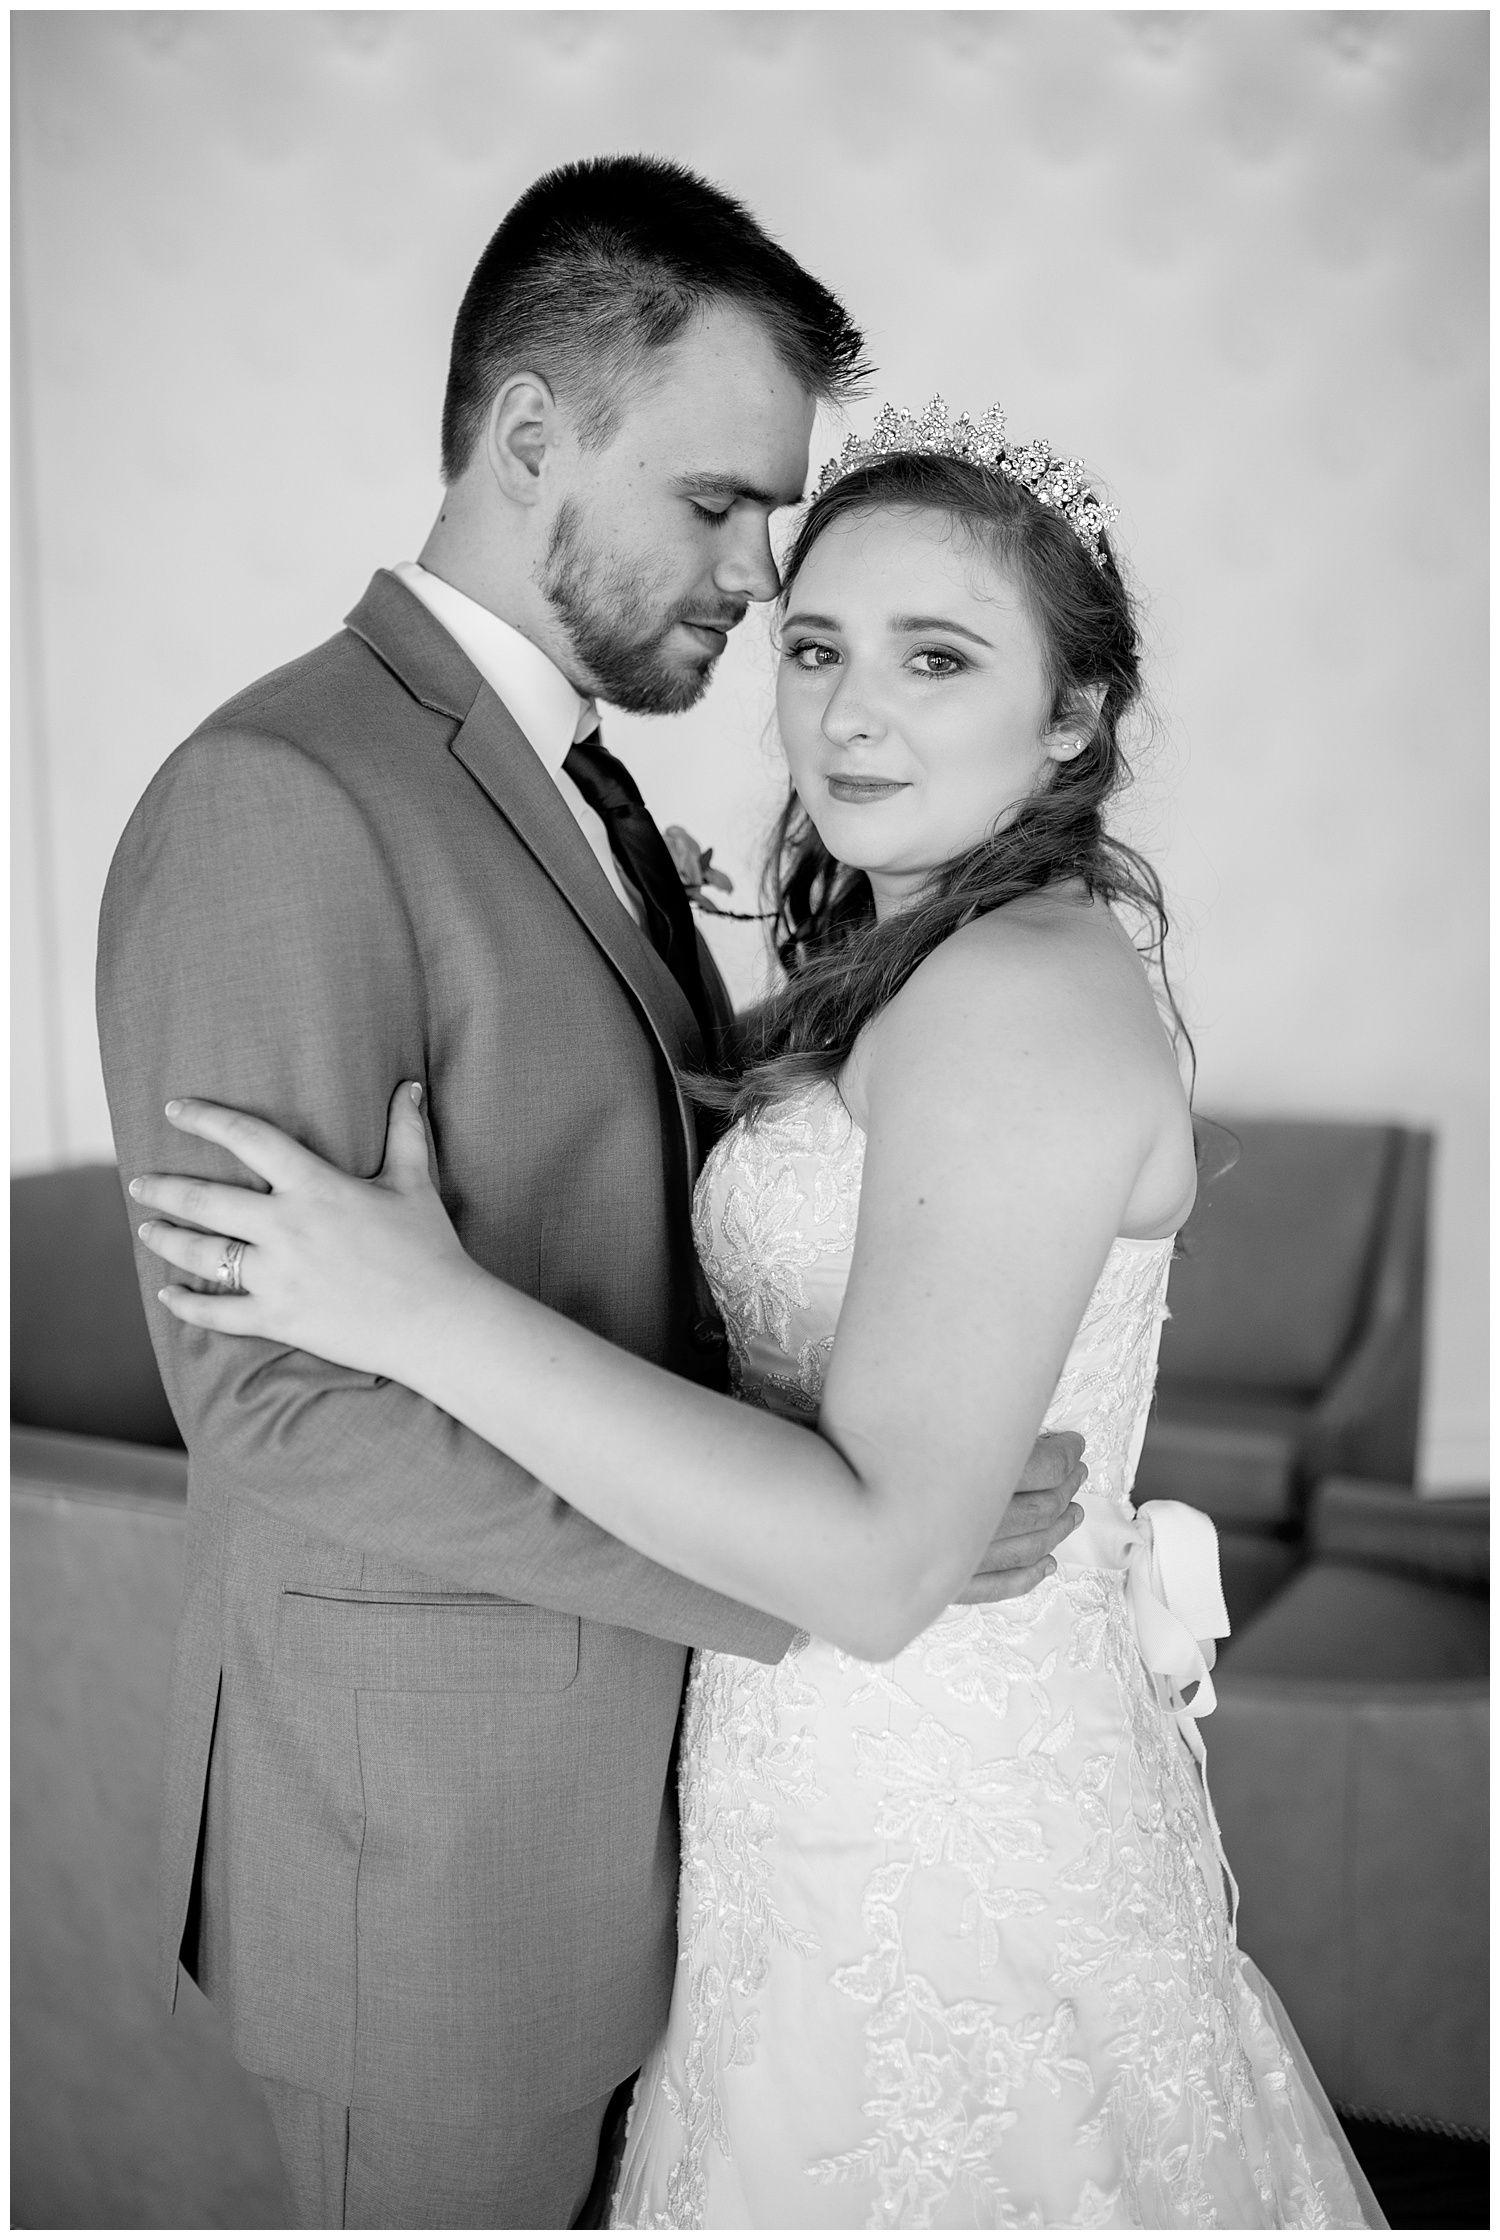 TheSmythCollective-Best-Cincinnati-Wedding-Photographer-Urban-Downtown-Covington-Wedding-02.jpg